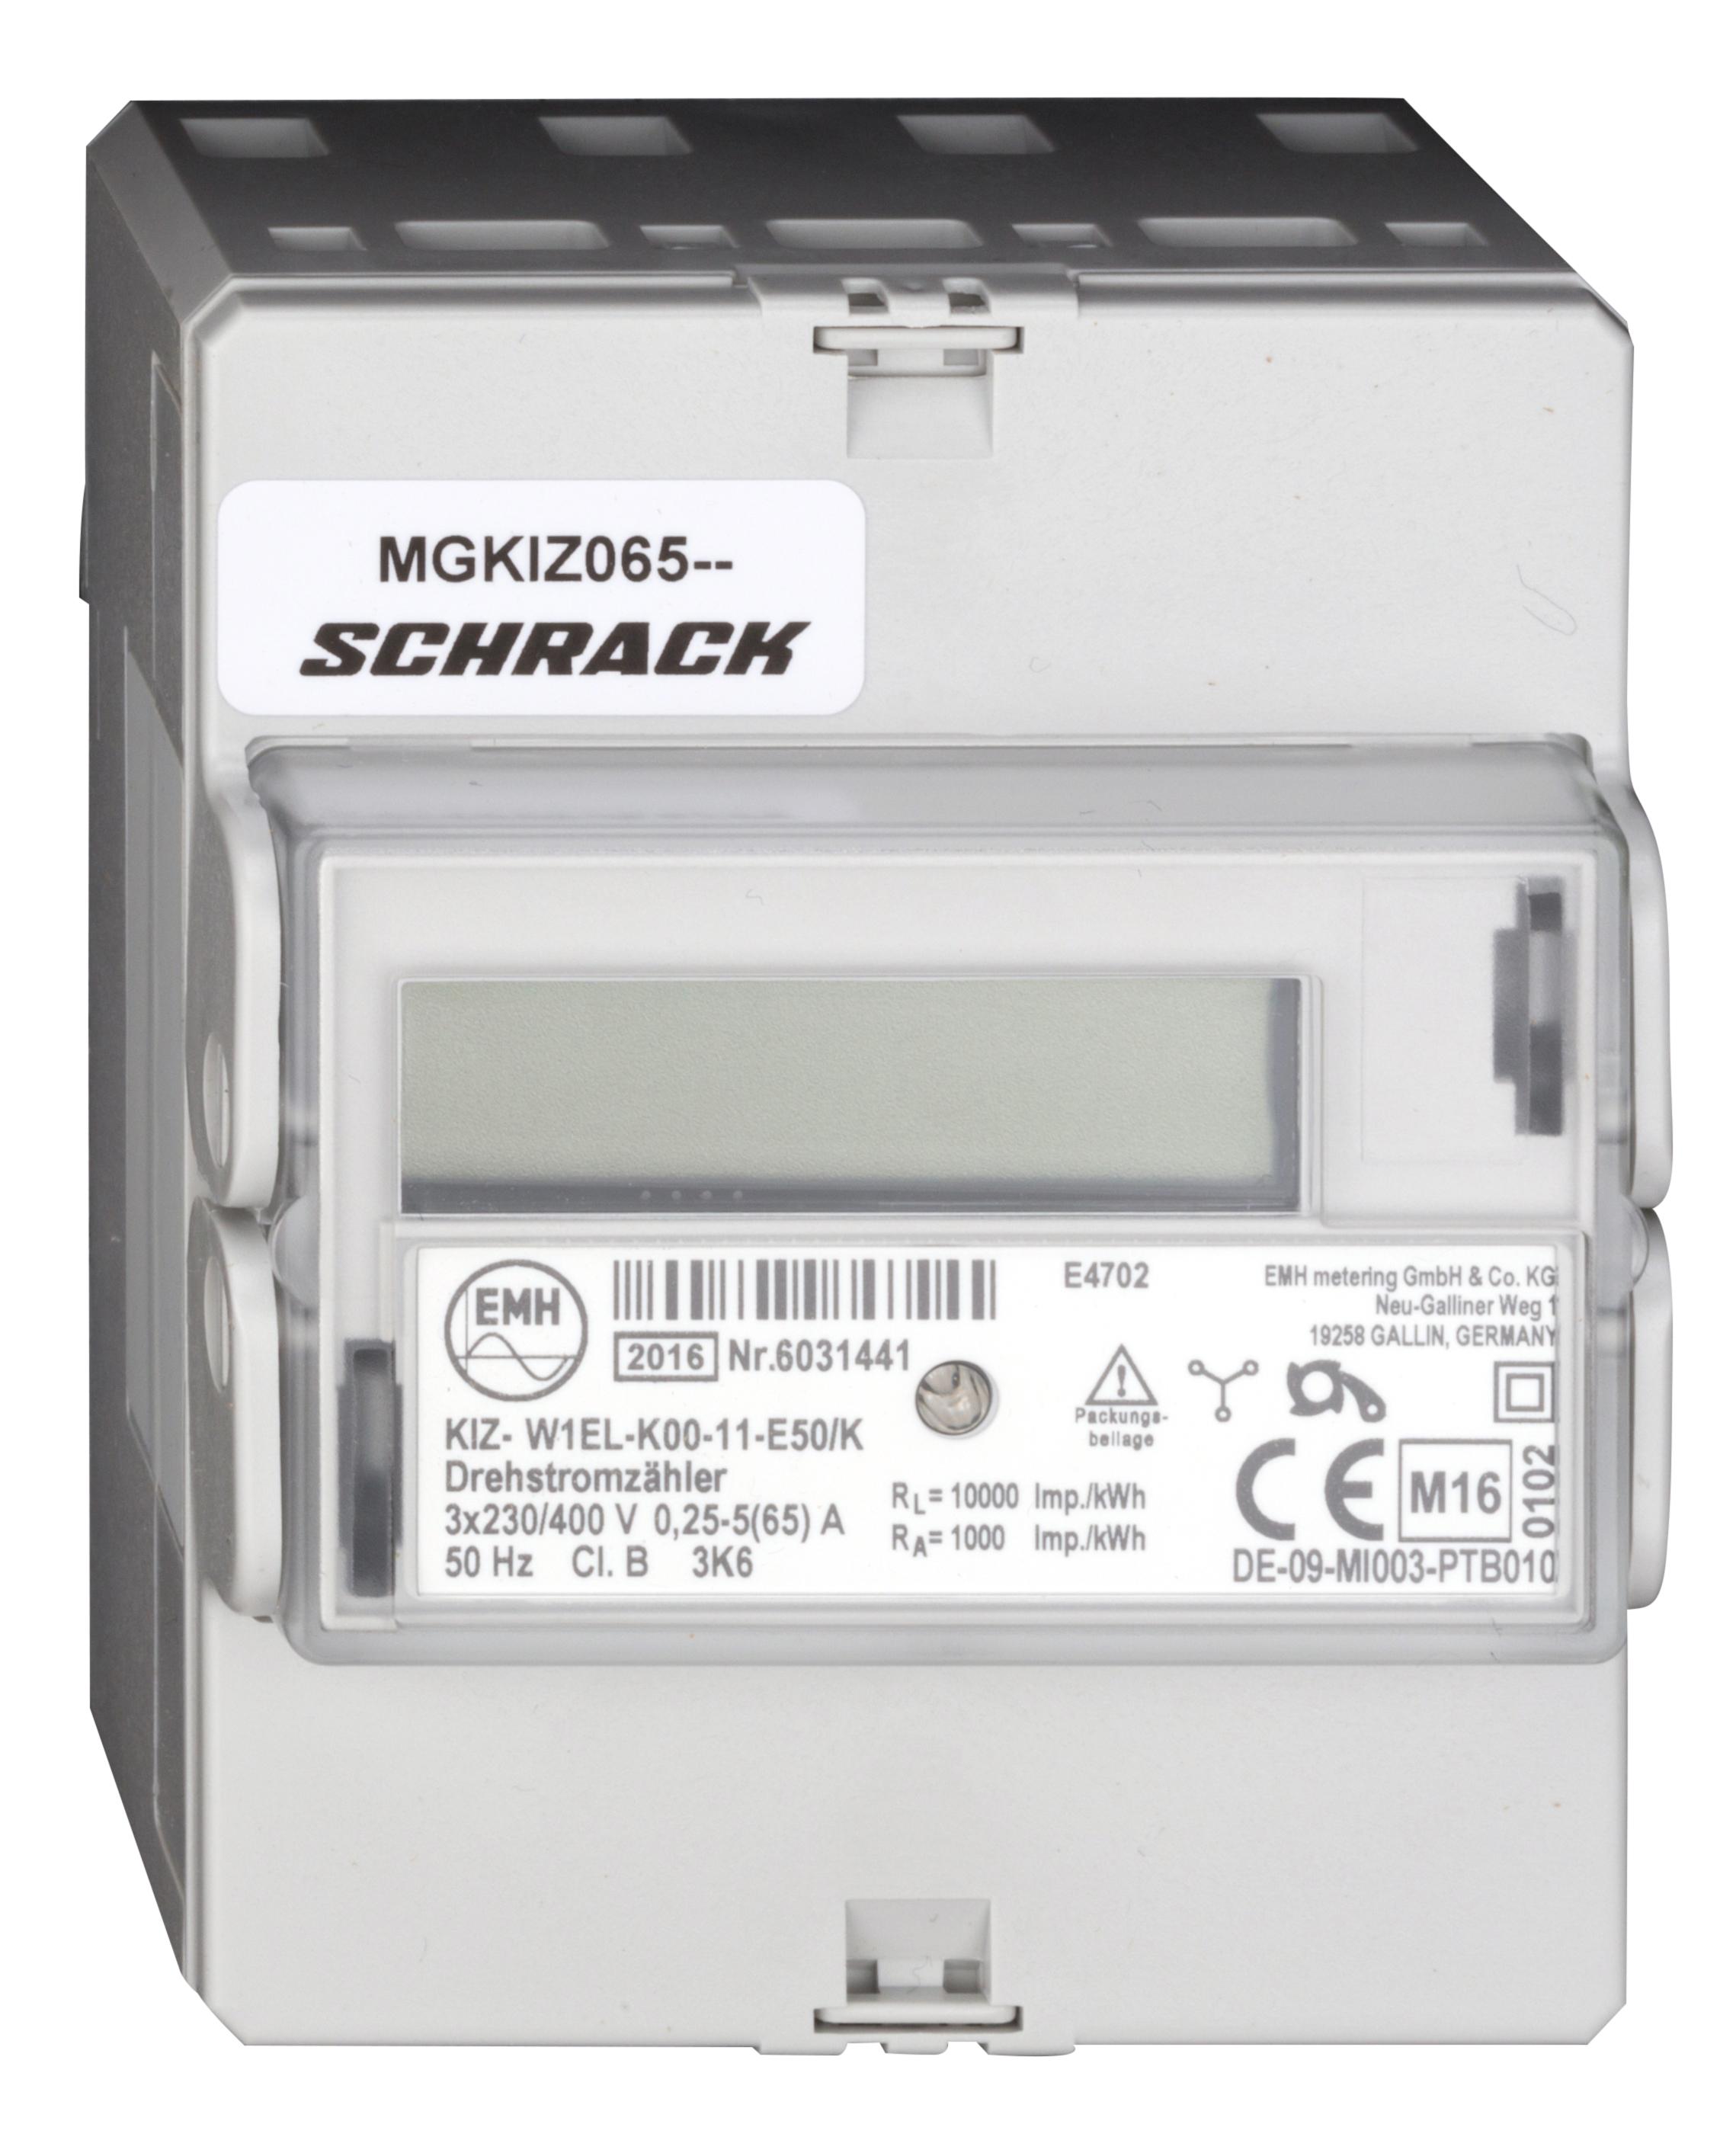 1 Stk Digitaler Drehstromzähler 65A, 2 Tarife, mit MID, 4TE MGKIZ065--